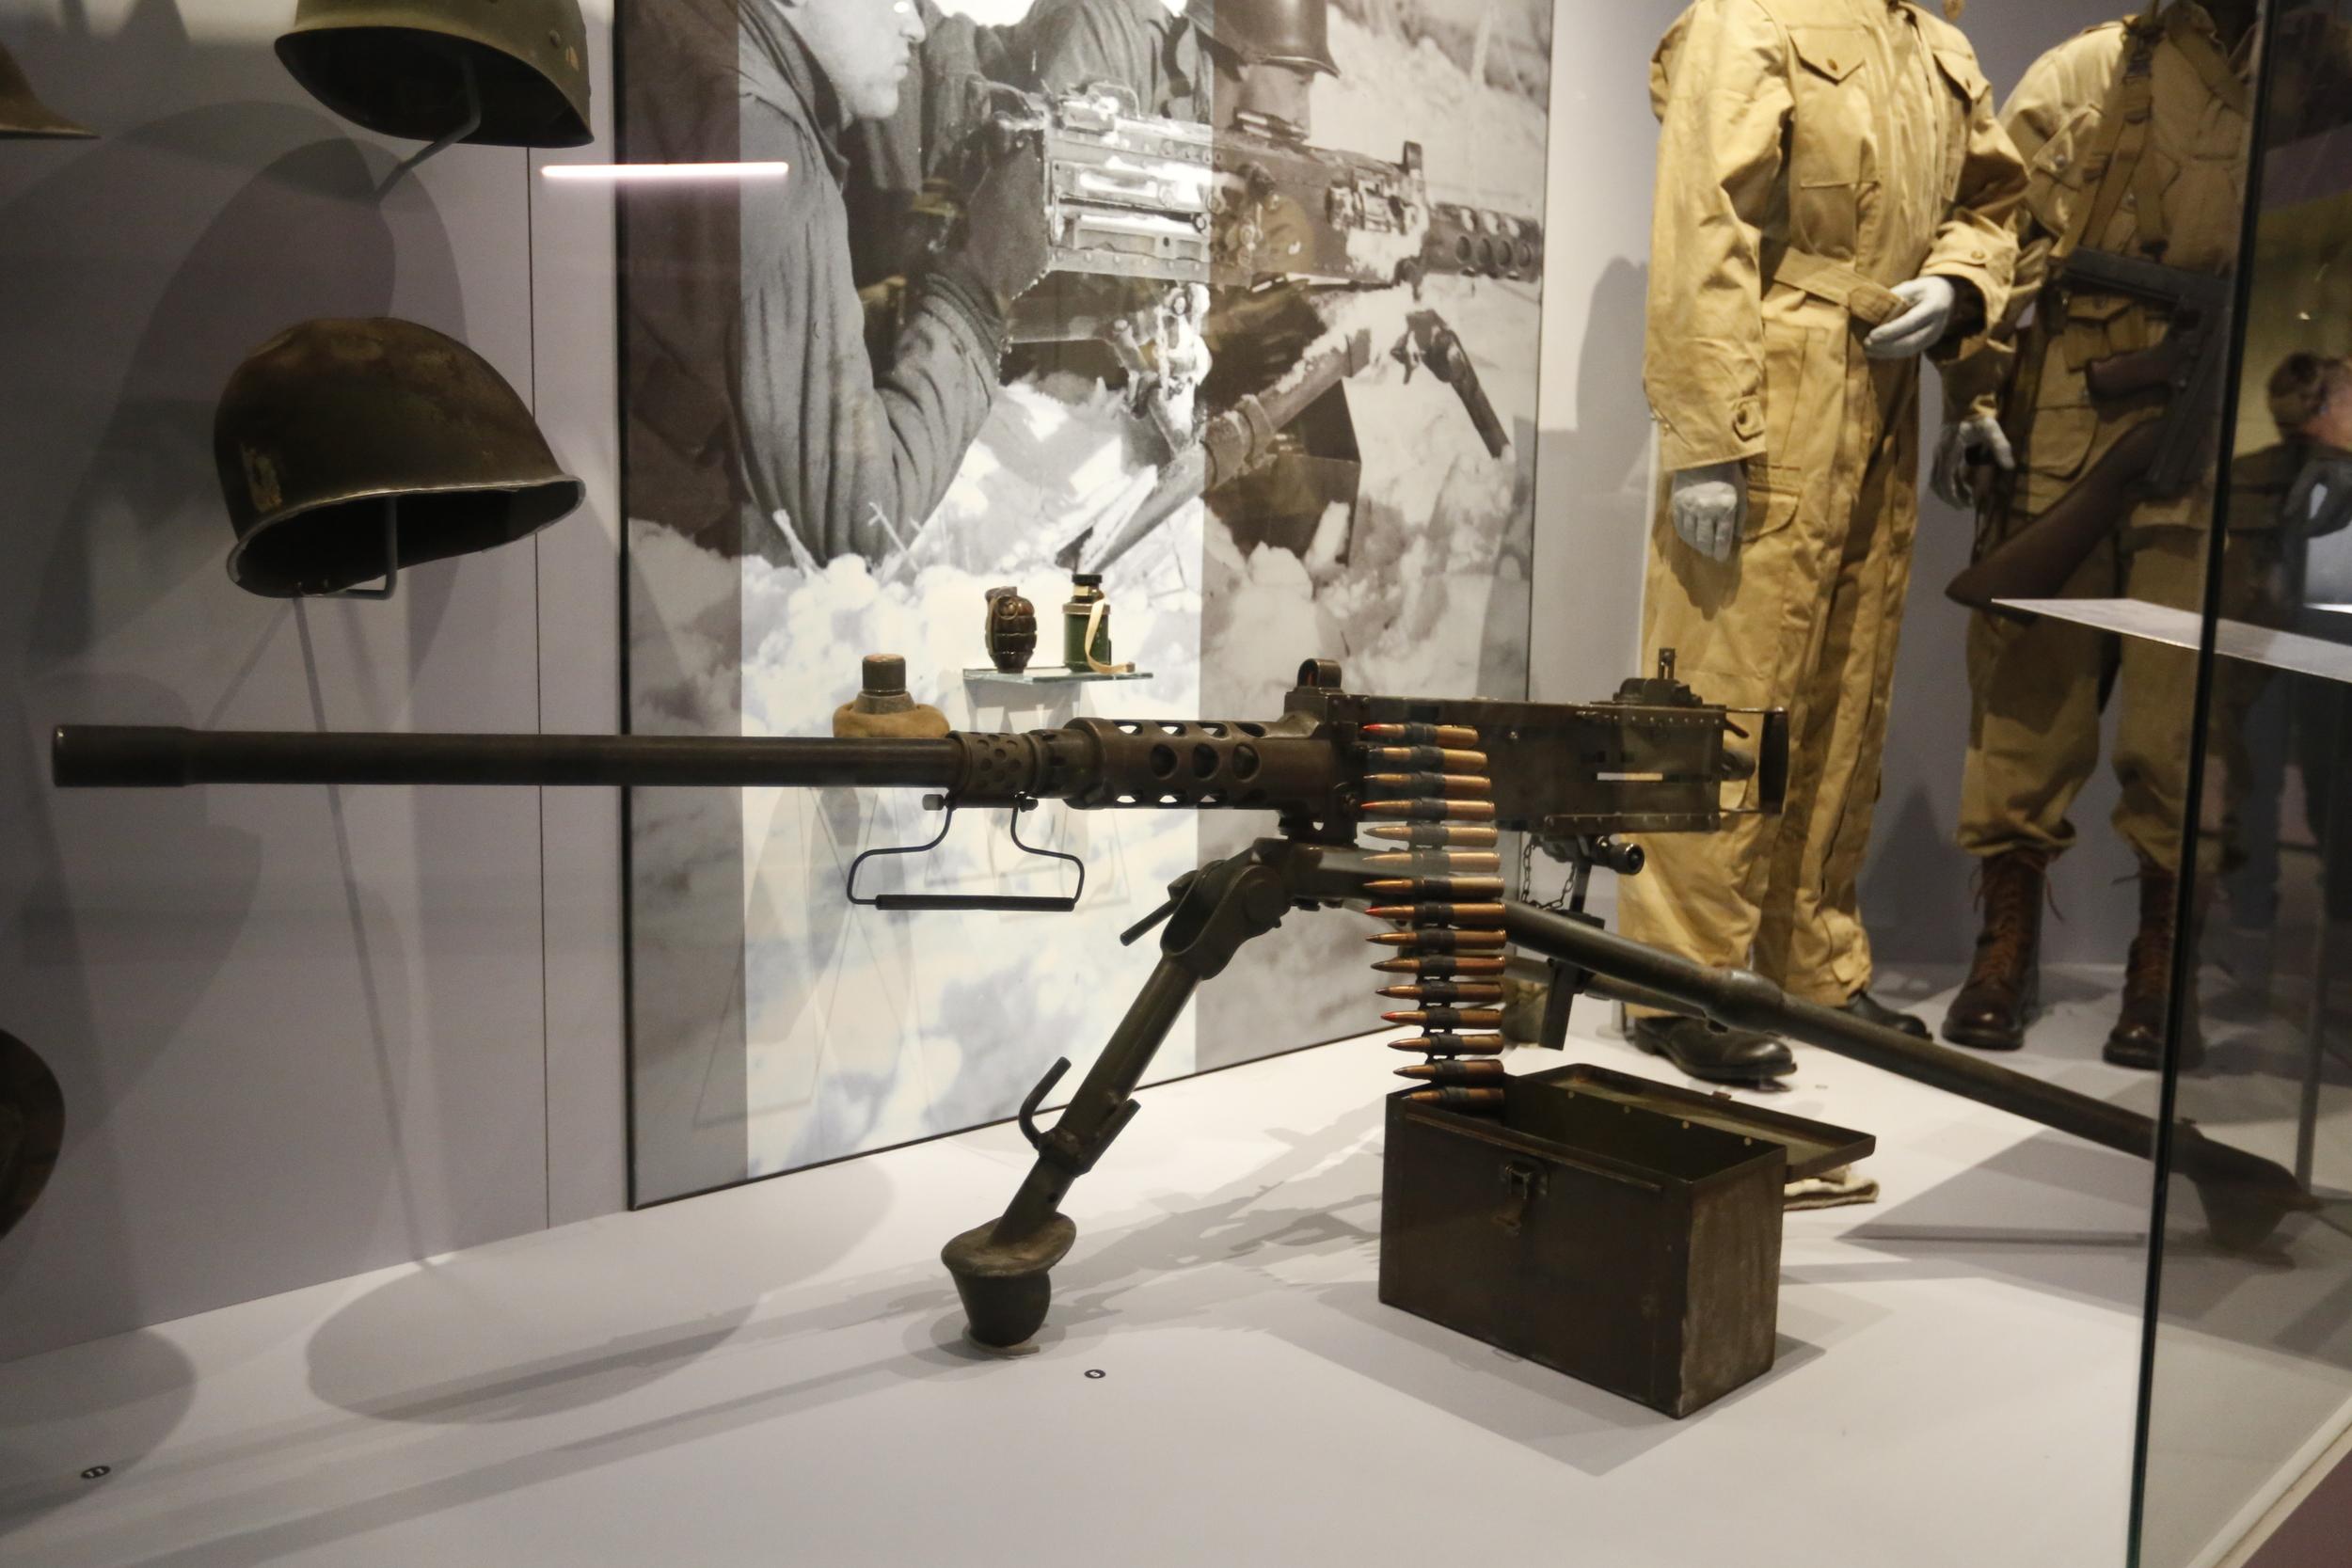 machine gun, heavy duty machine gun, bastogne, bastogne belgium, belgium, war museum, WWII, visit belgium, bicycle touring apocalypse